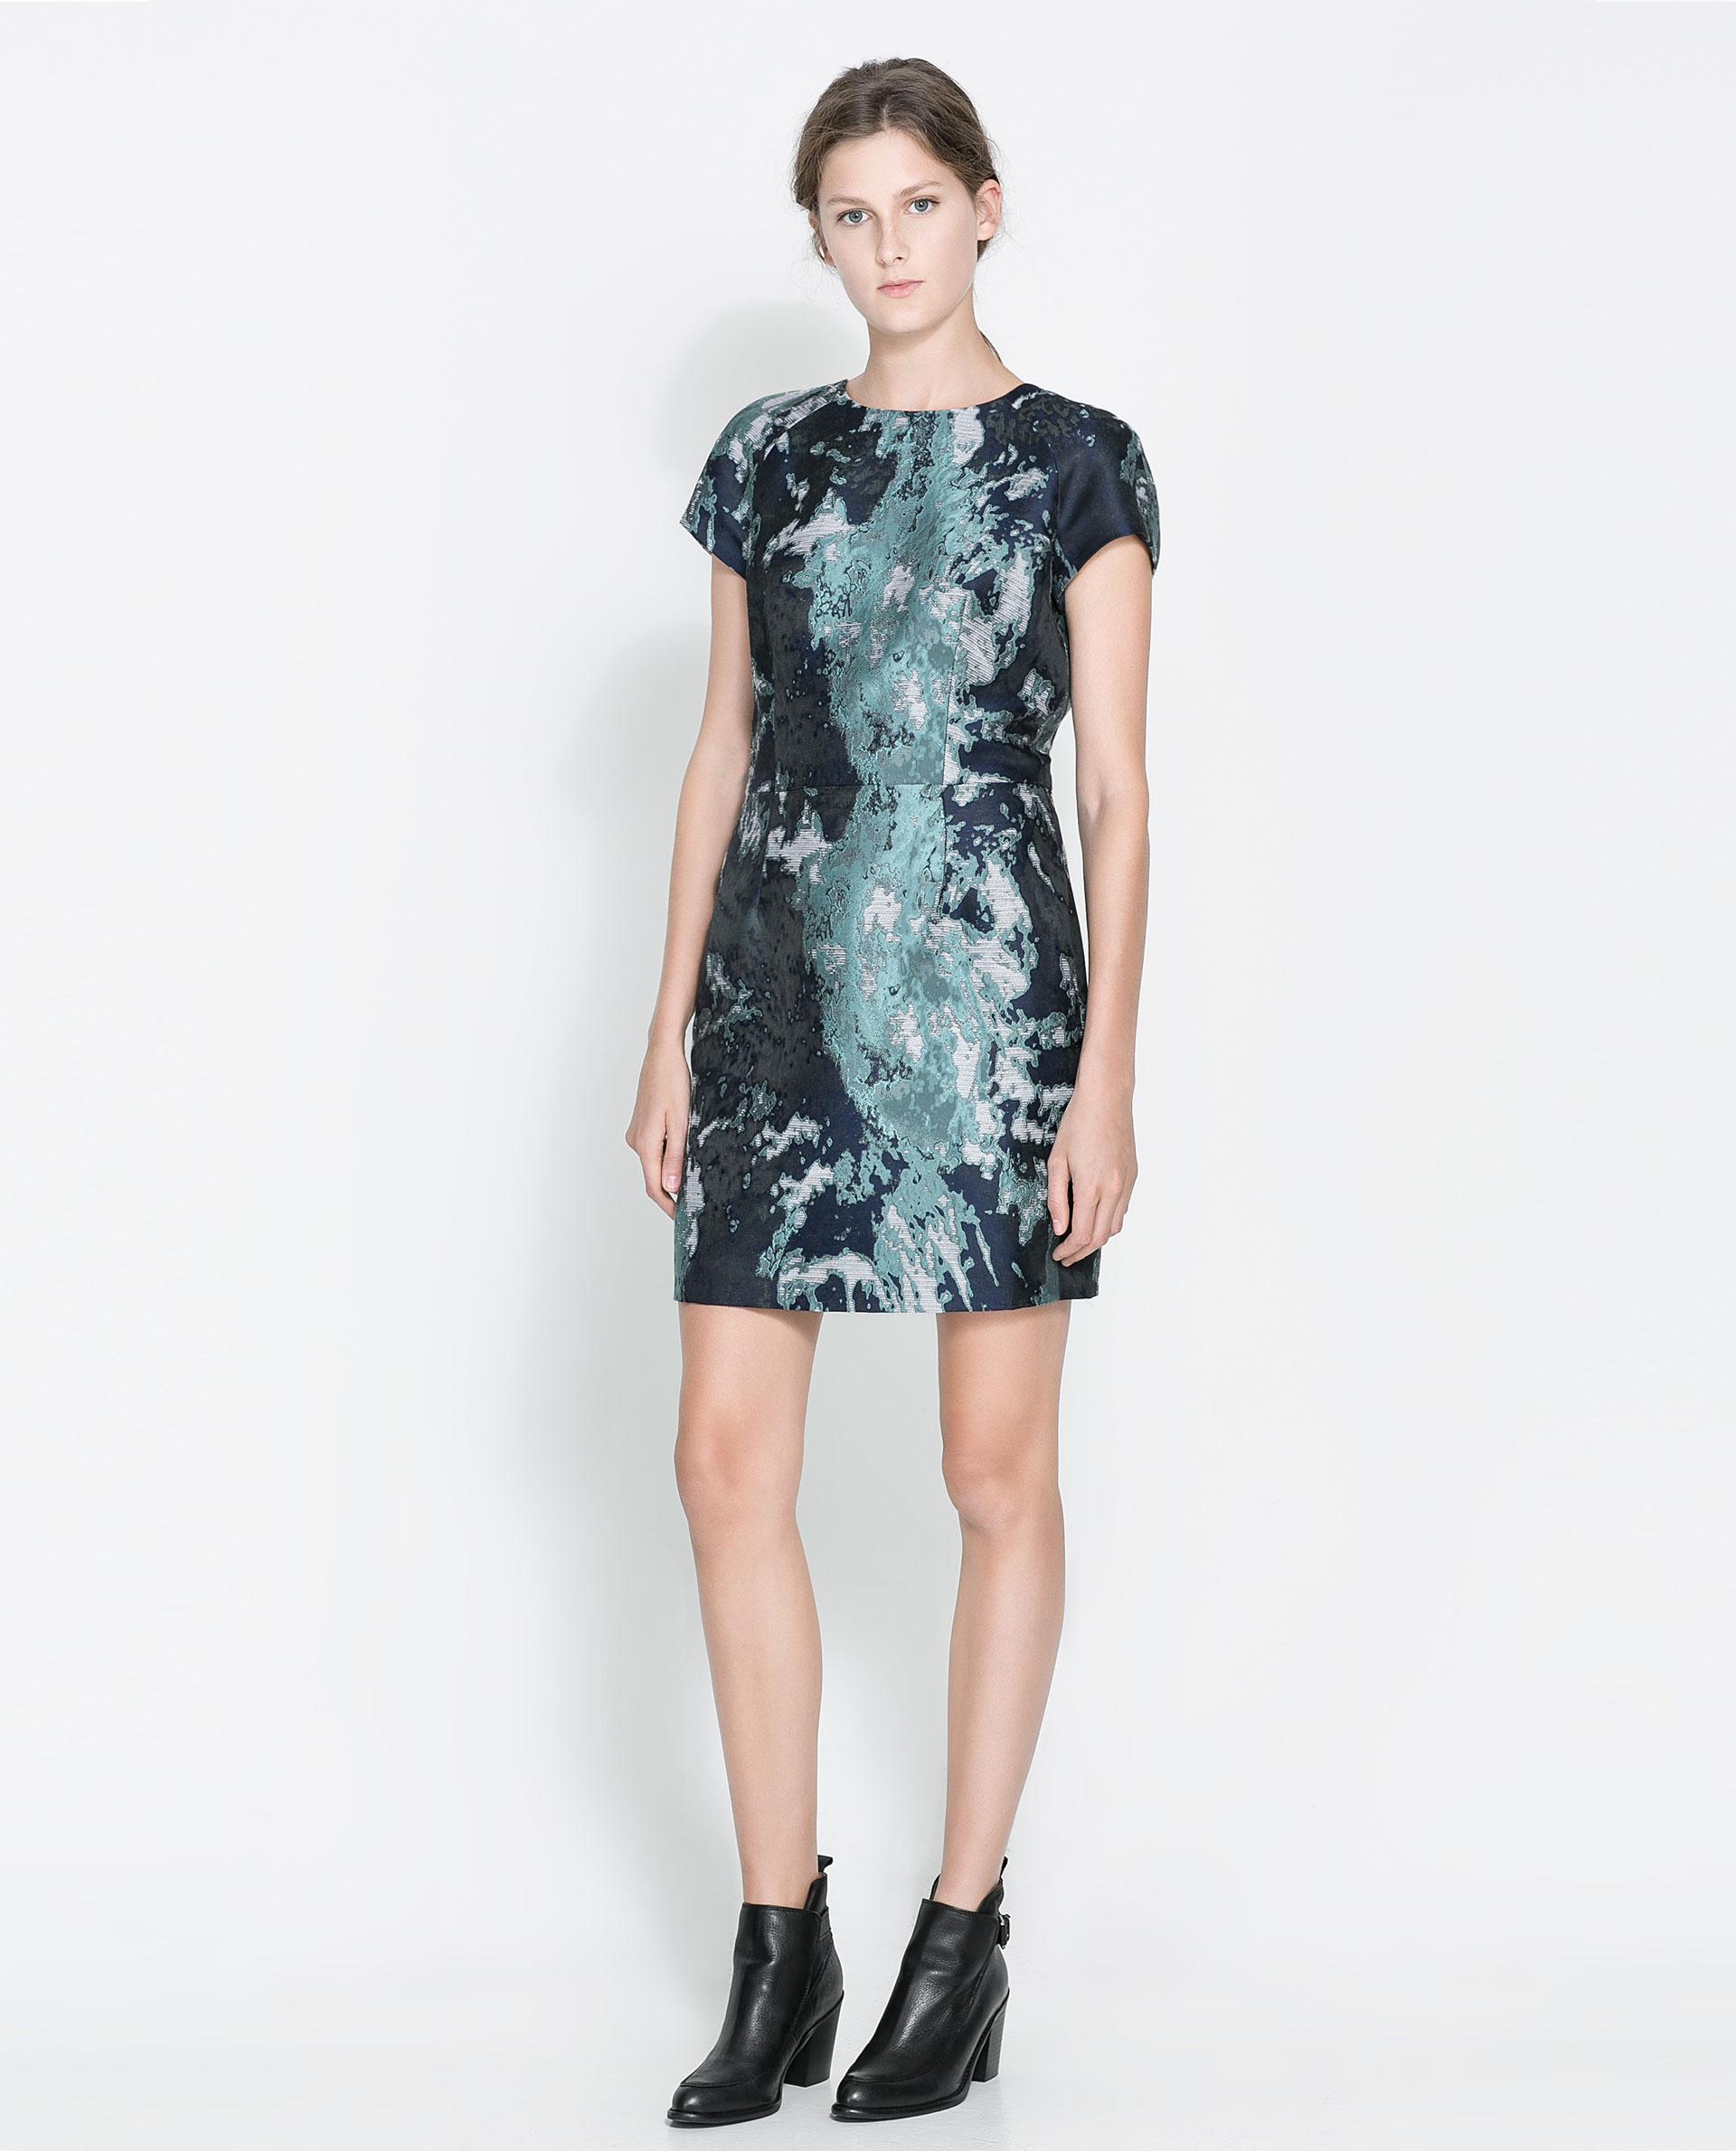 Zara Womens Clothing Sale